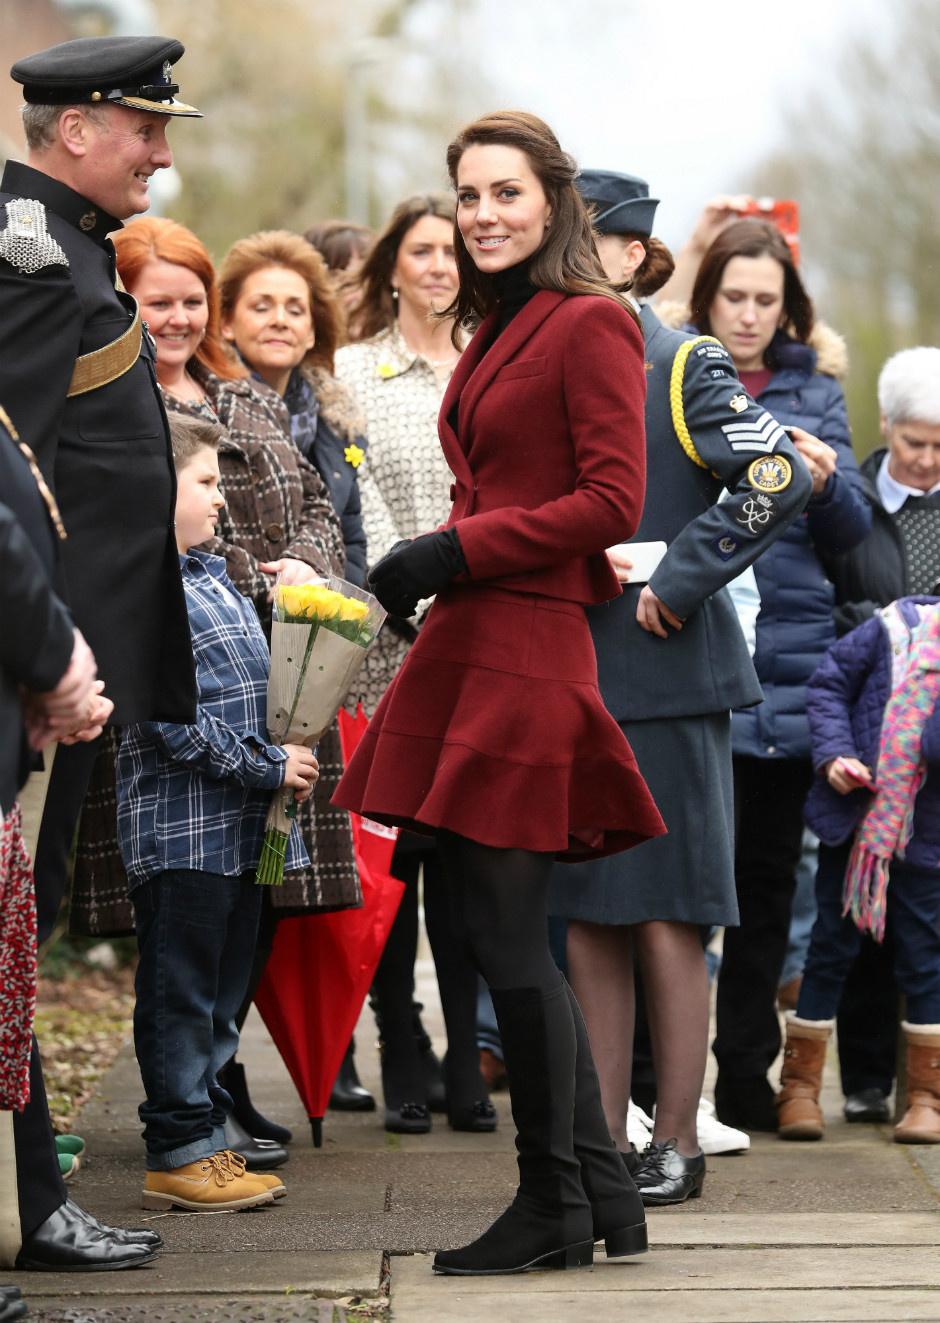 10 раз, когда Кейт Миддлтон пренебрегла королевским дресс-кодом фото [9]